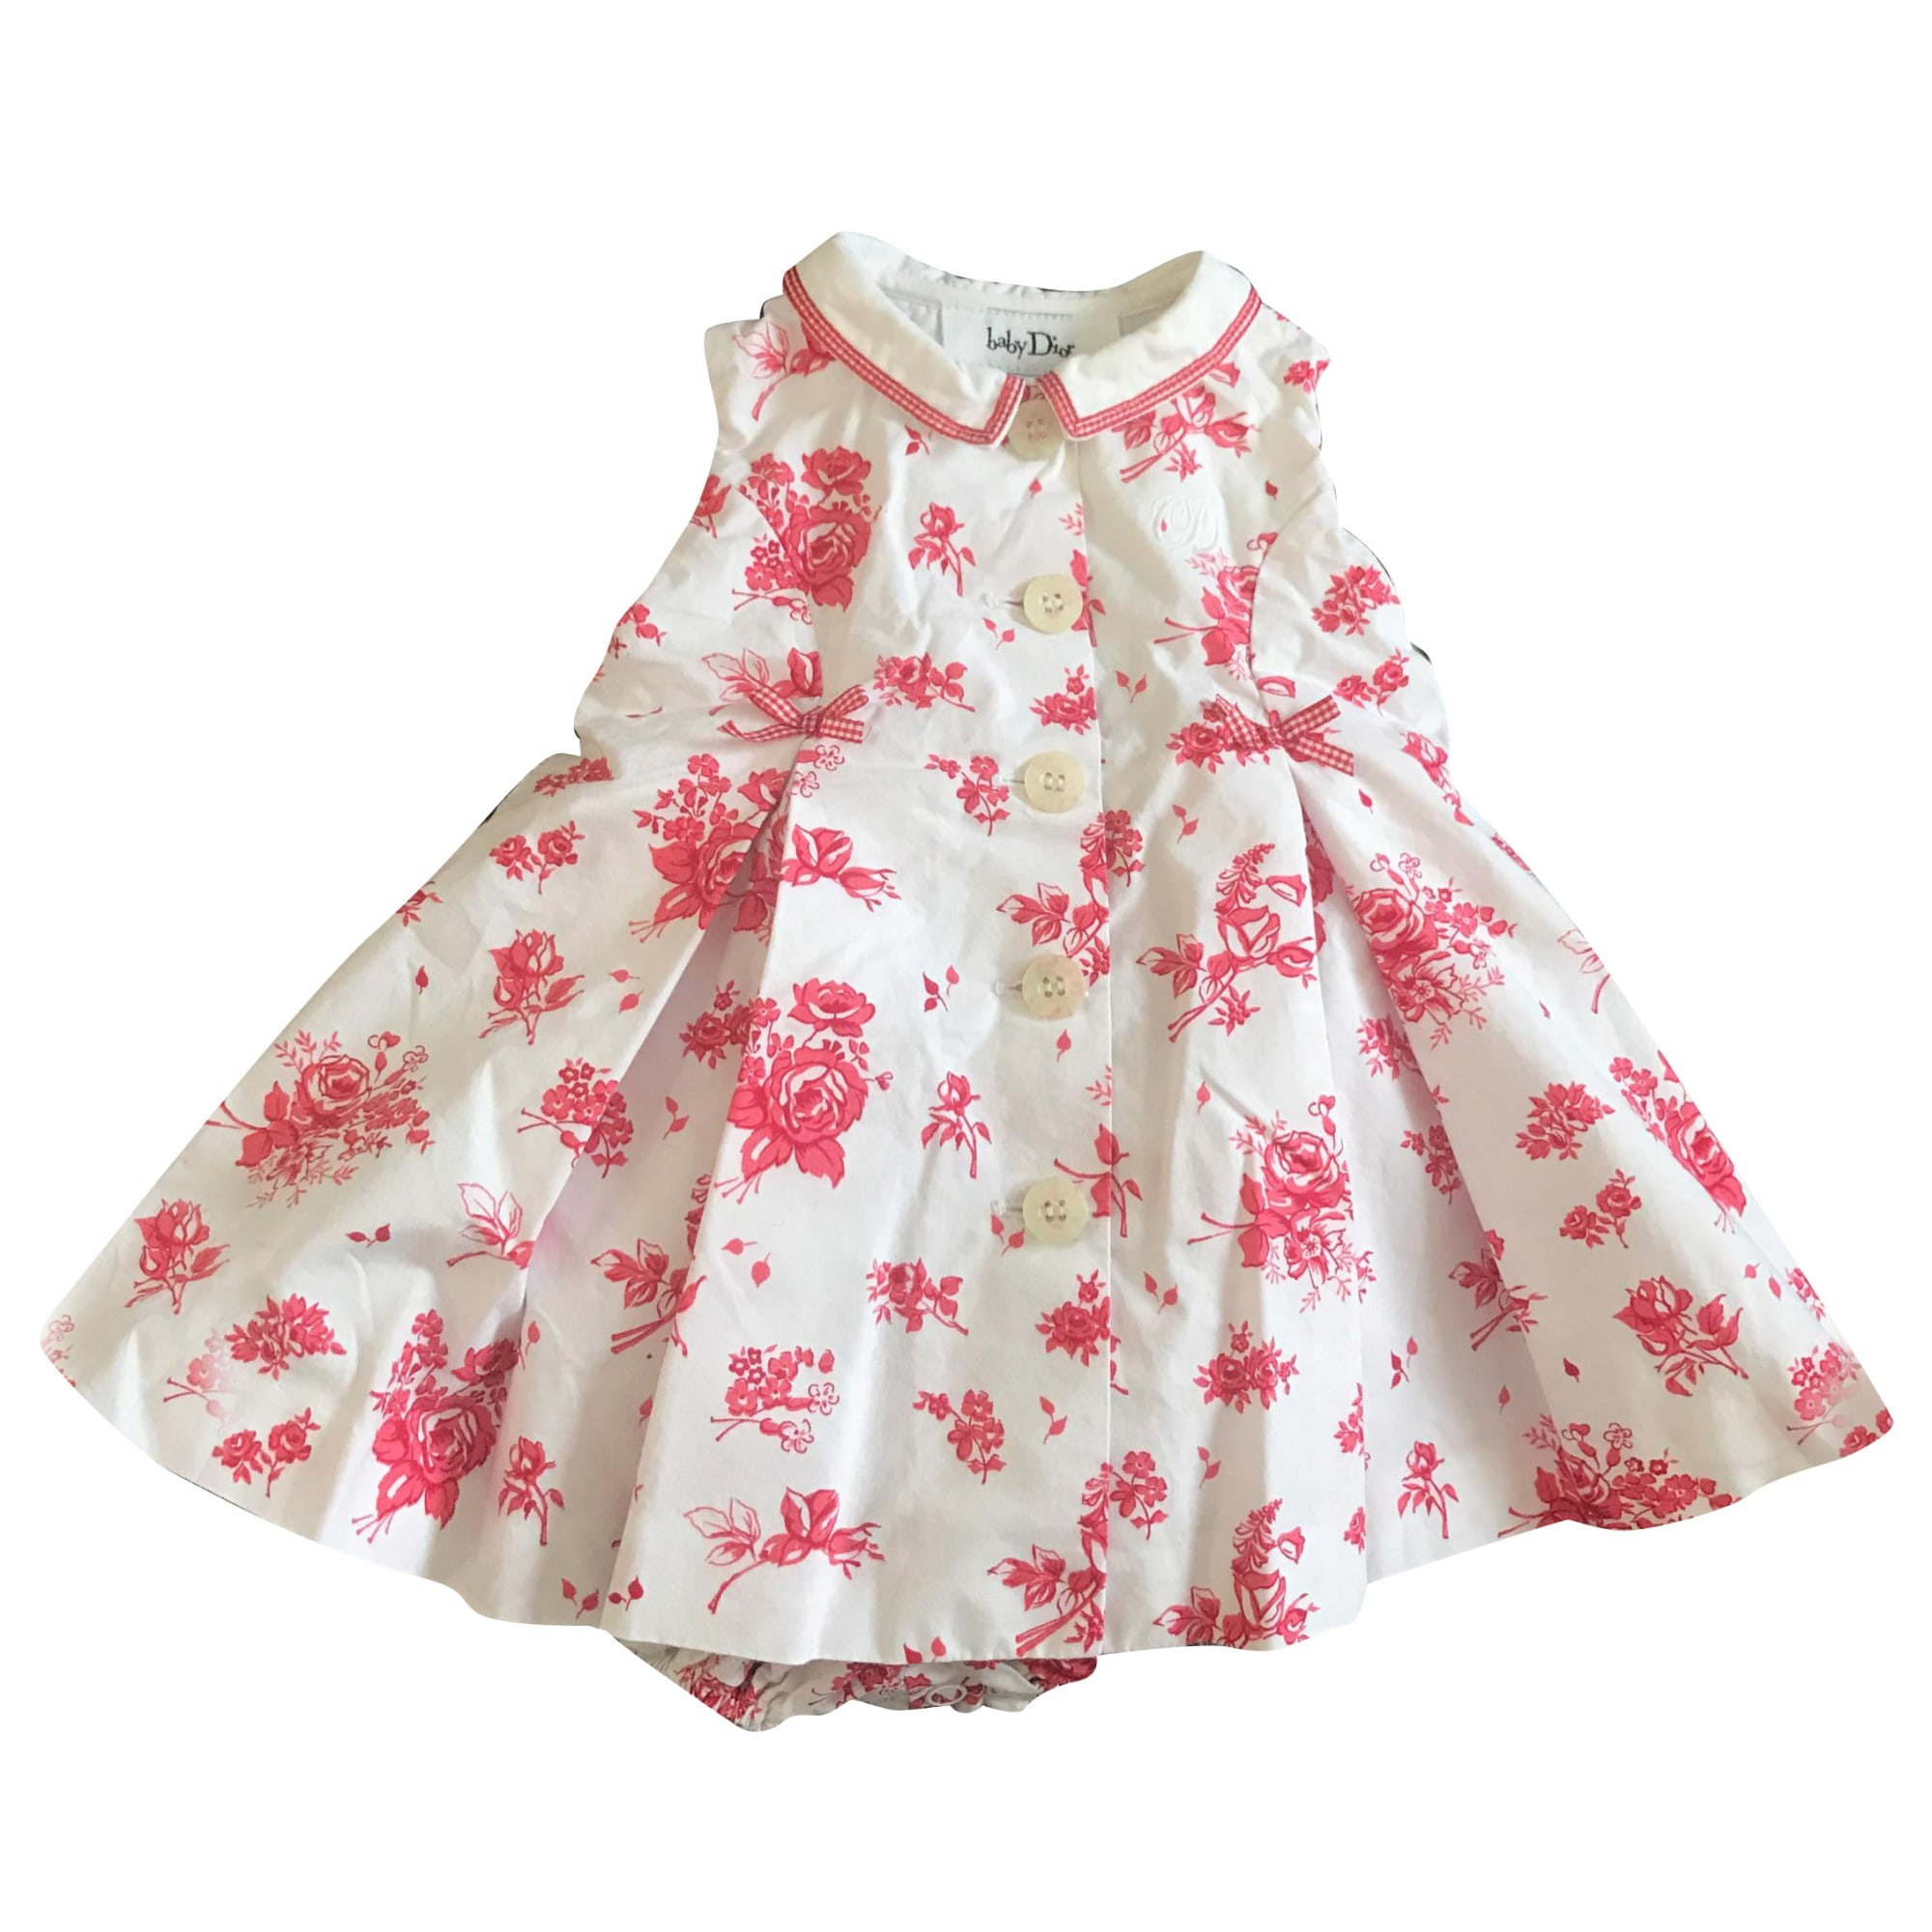 Kleid BABY DIOR Rot, bordeauxrot